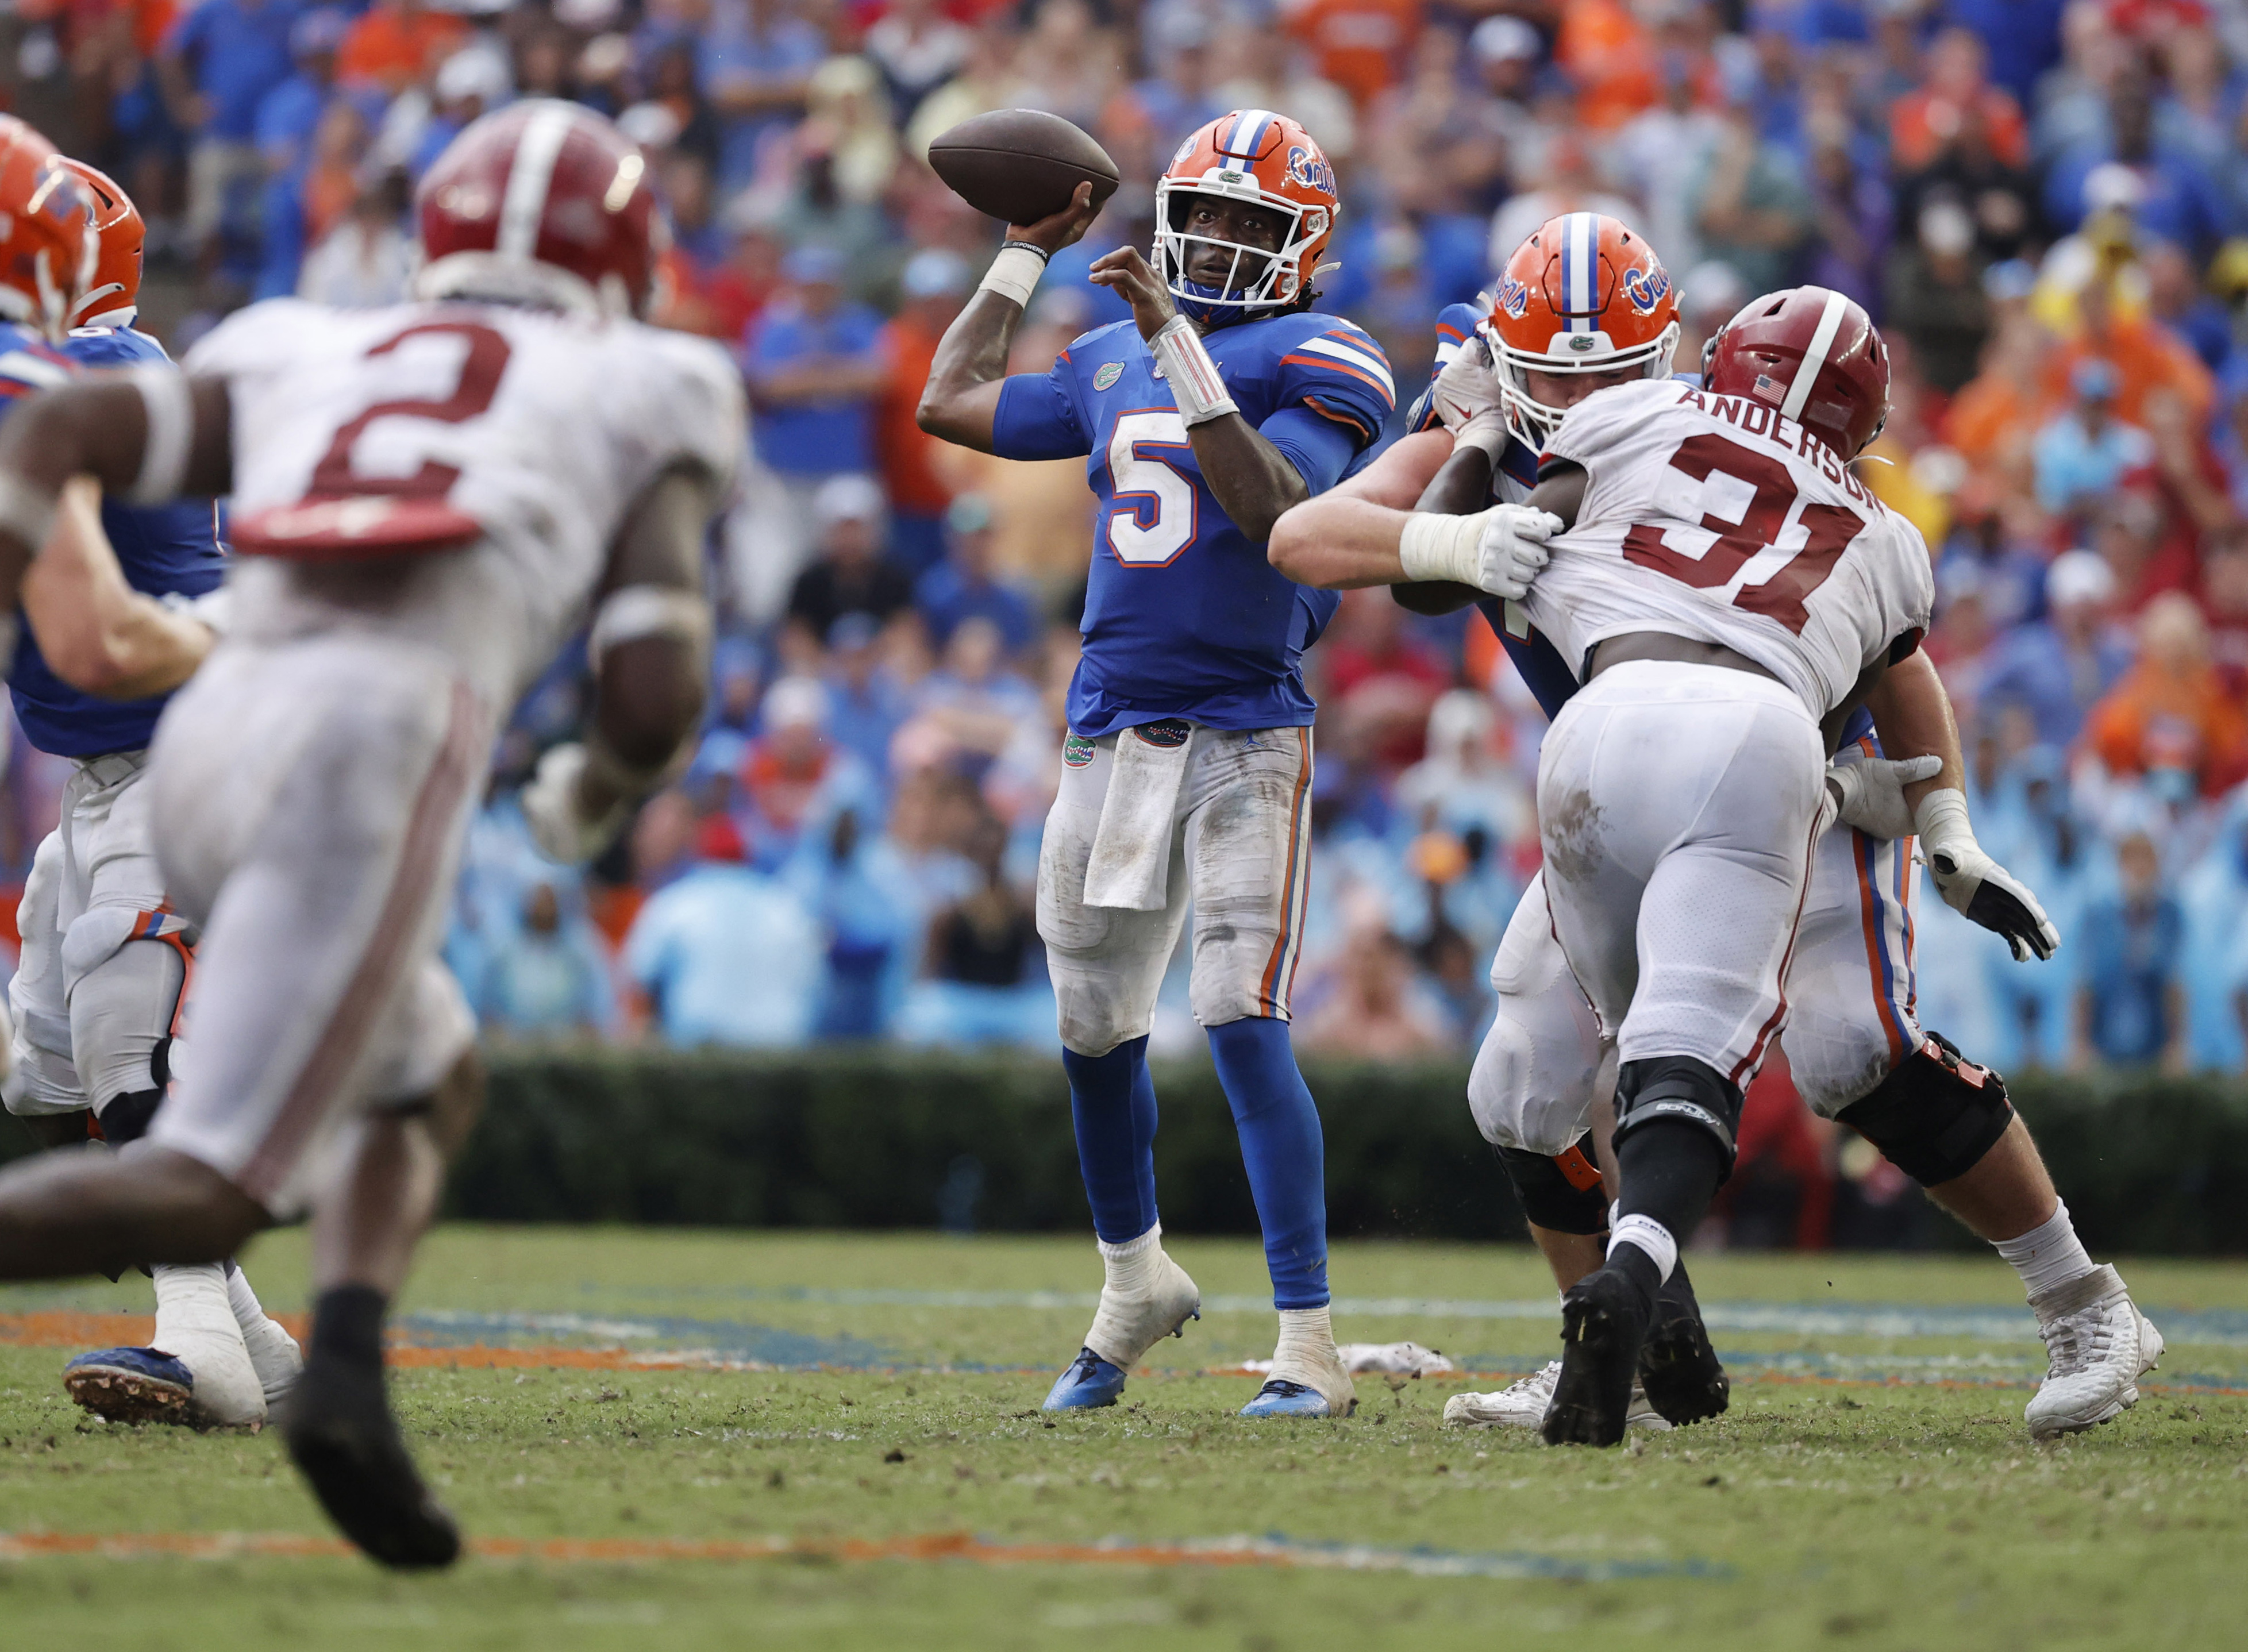 Florida Gators quarterback Emory Jones throws the ball against the Alabama Crimson Tide during the second half at Ben Hill Griffin Stadium